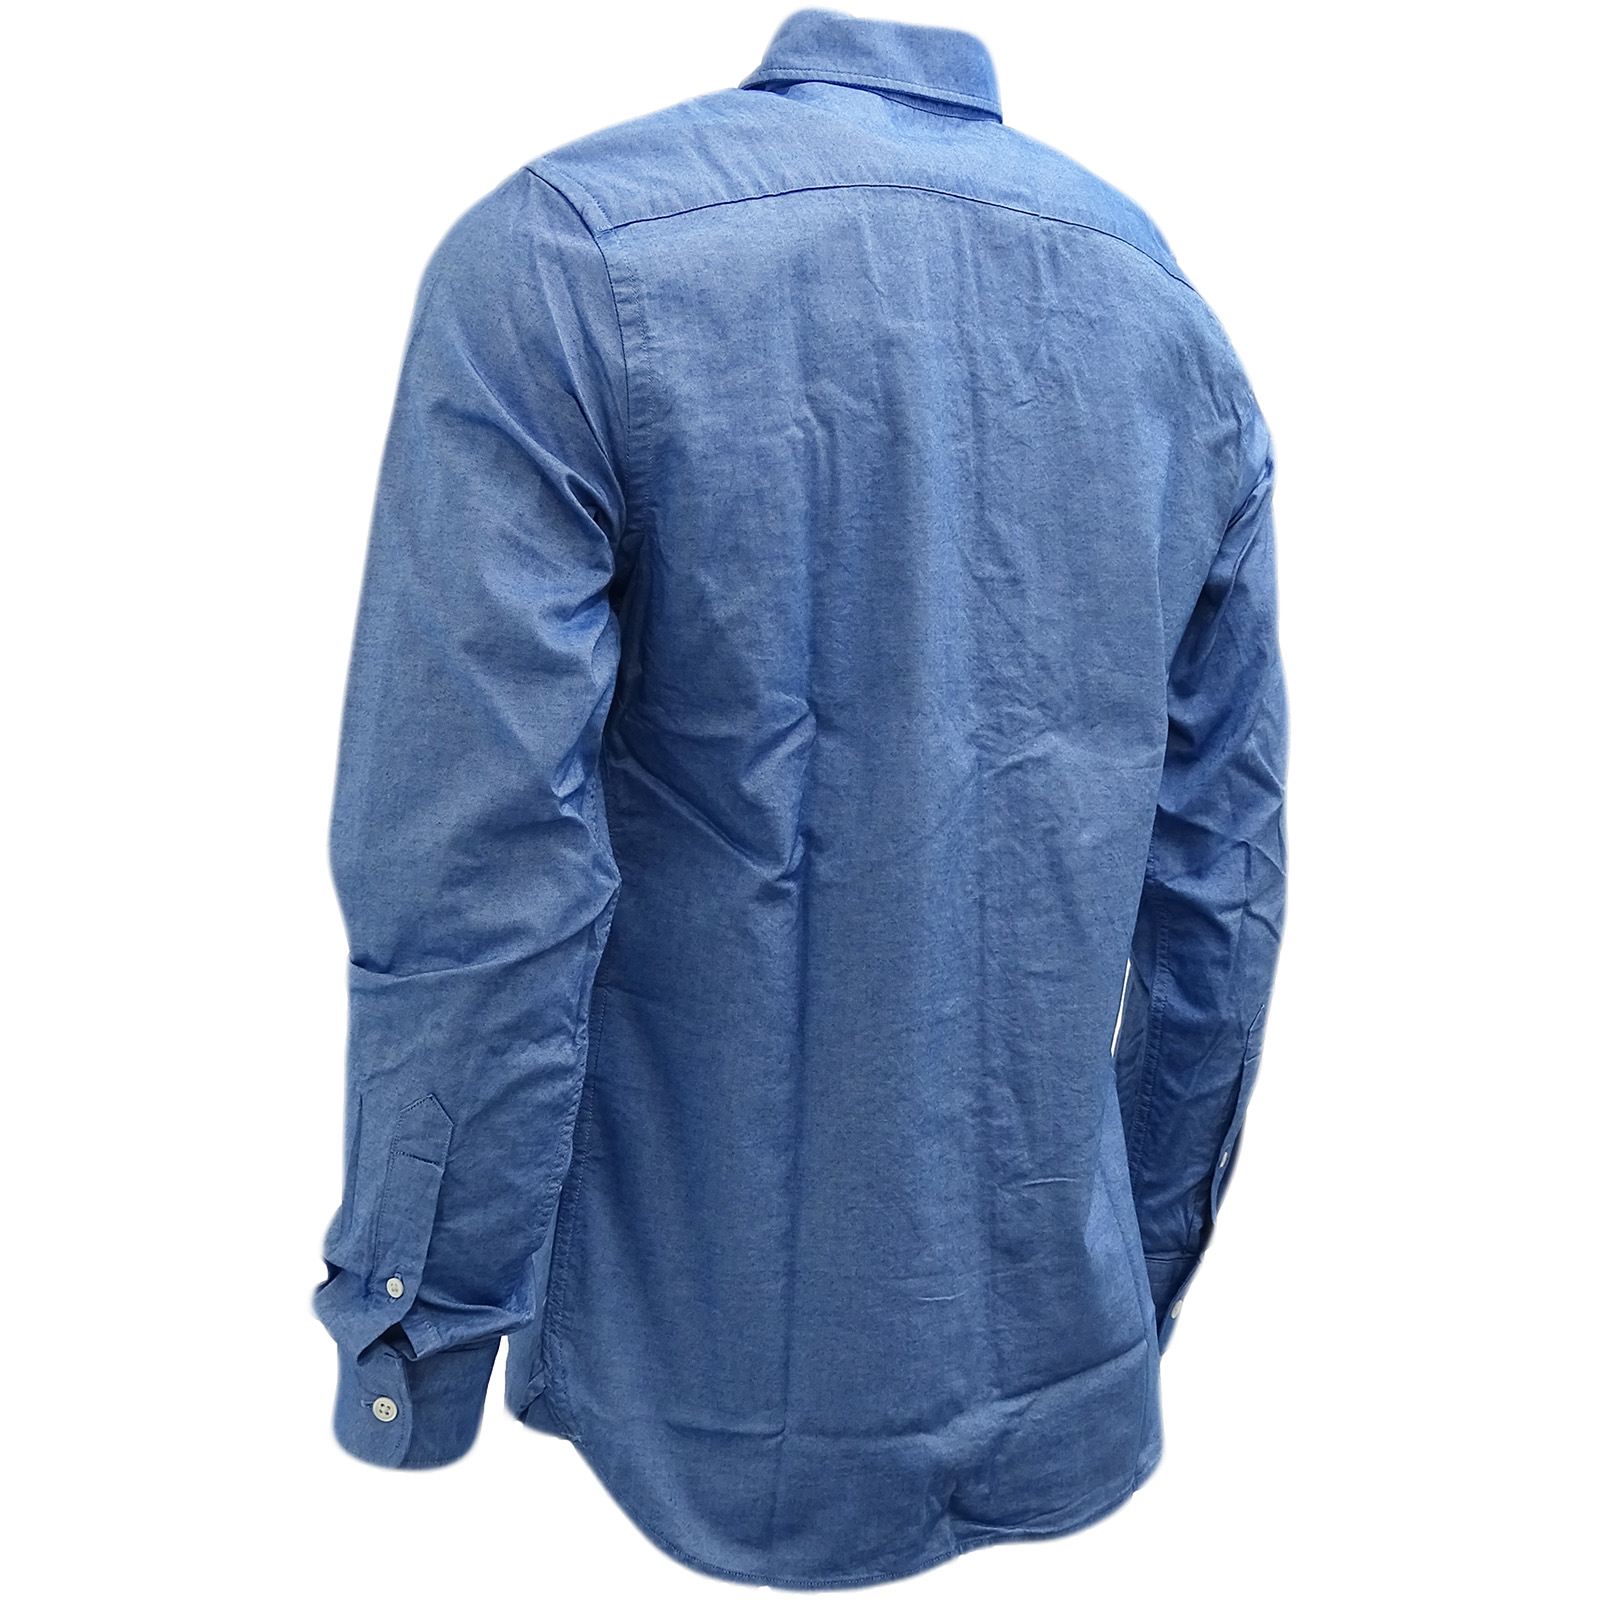 Strauss Shirt True 03 Cotton Blue 37 65824 Levi Plain pOXdwOq